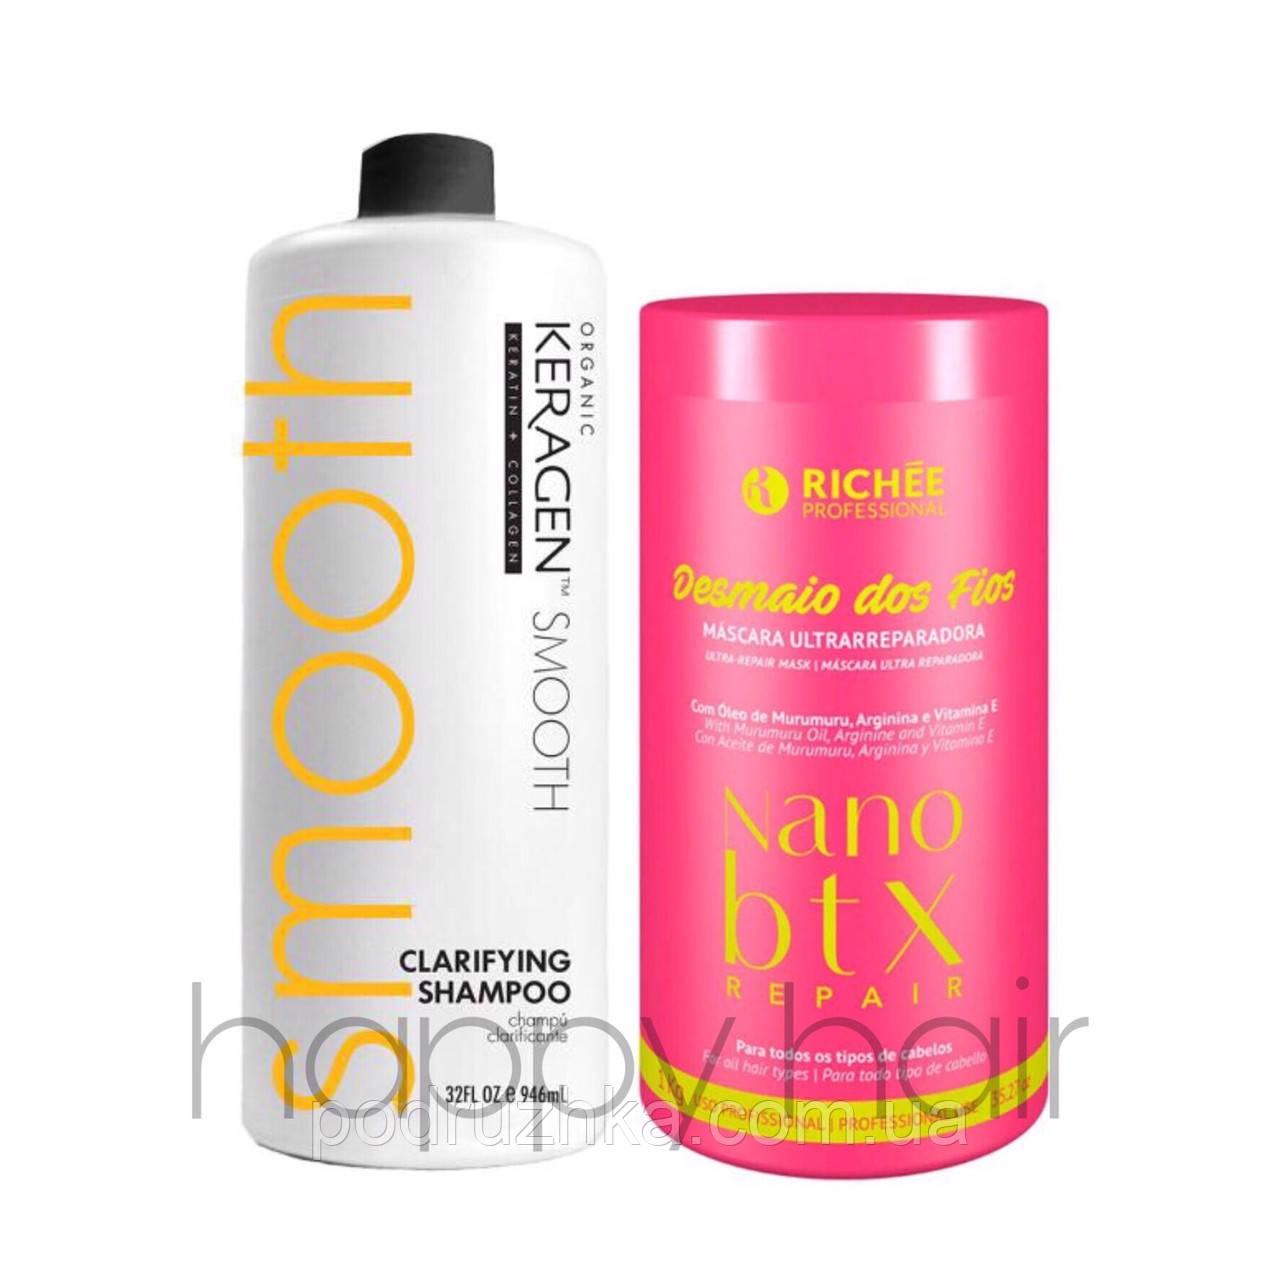 Richée Nano Btx Repair Desmaio dos Fios Набір Холодний ботекс для волосся 2х1000 р